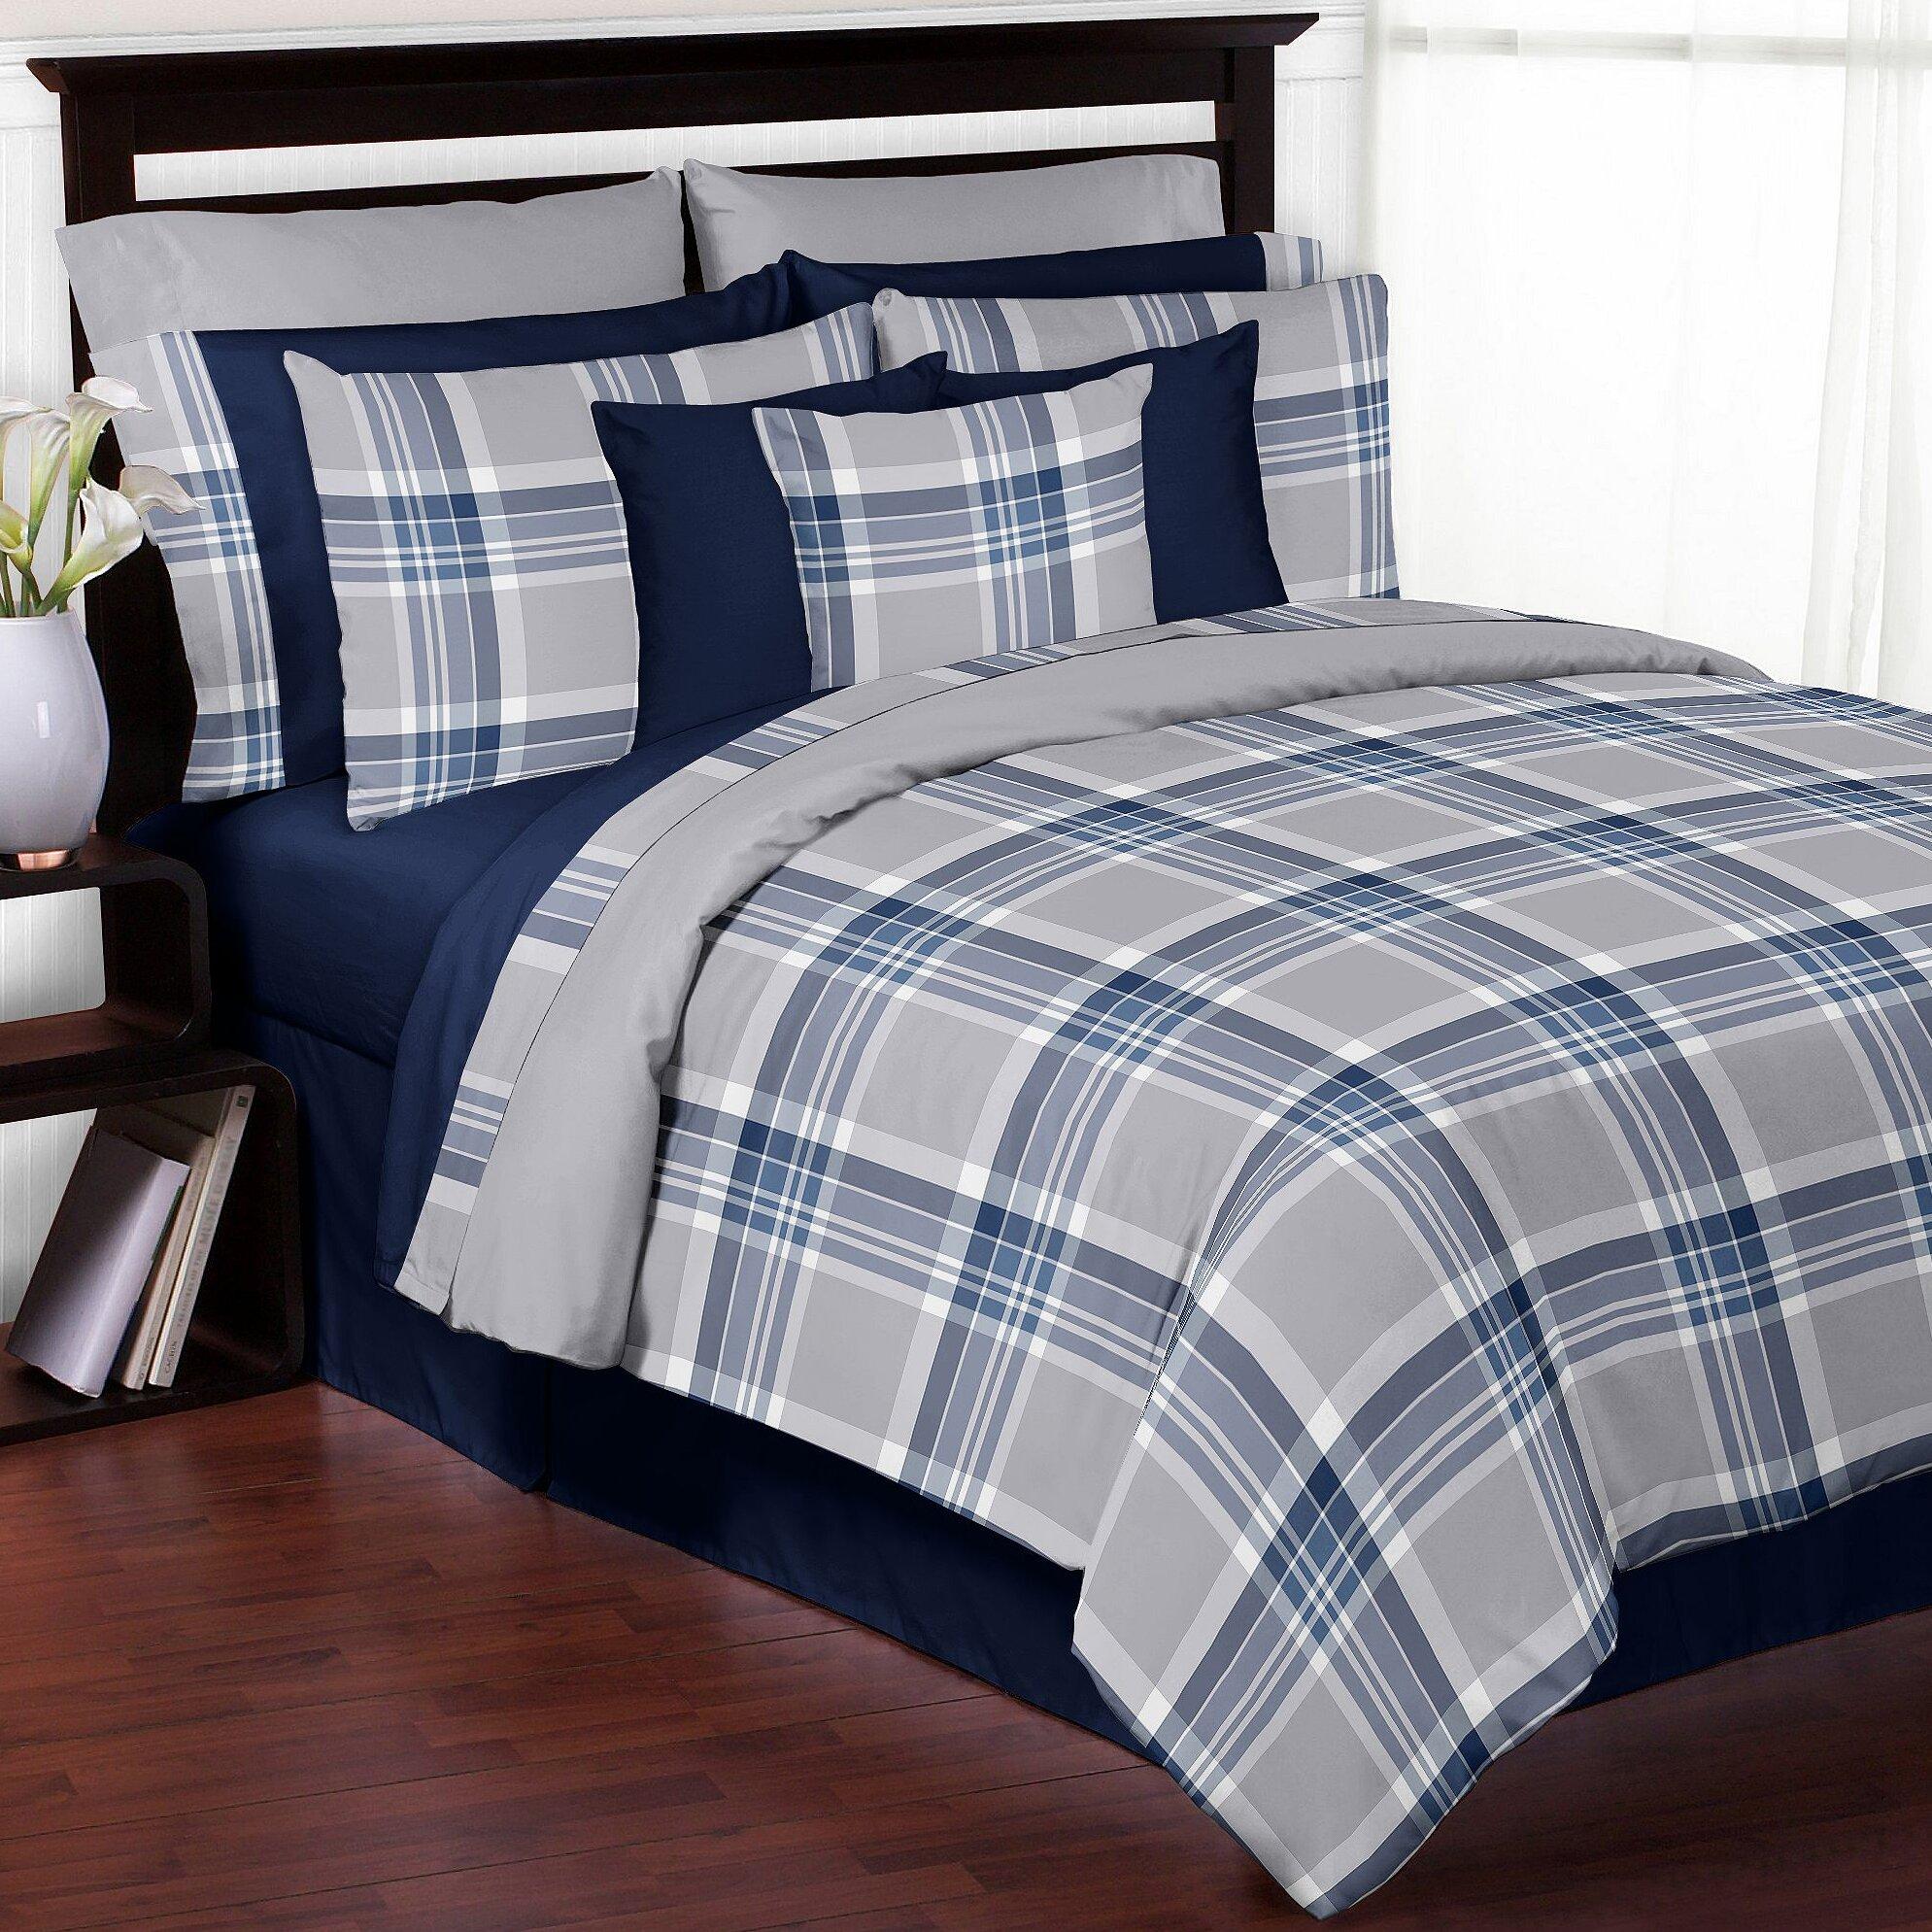 Plaid Bedroom Sweet Jojo Designs Plaid Comforter Set Reviews Wayfair